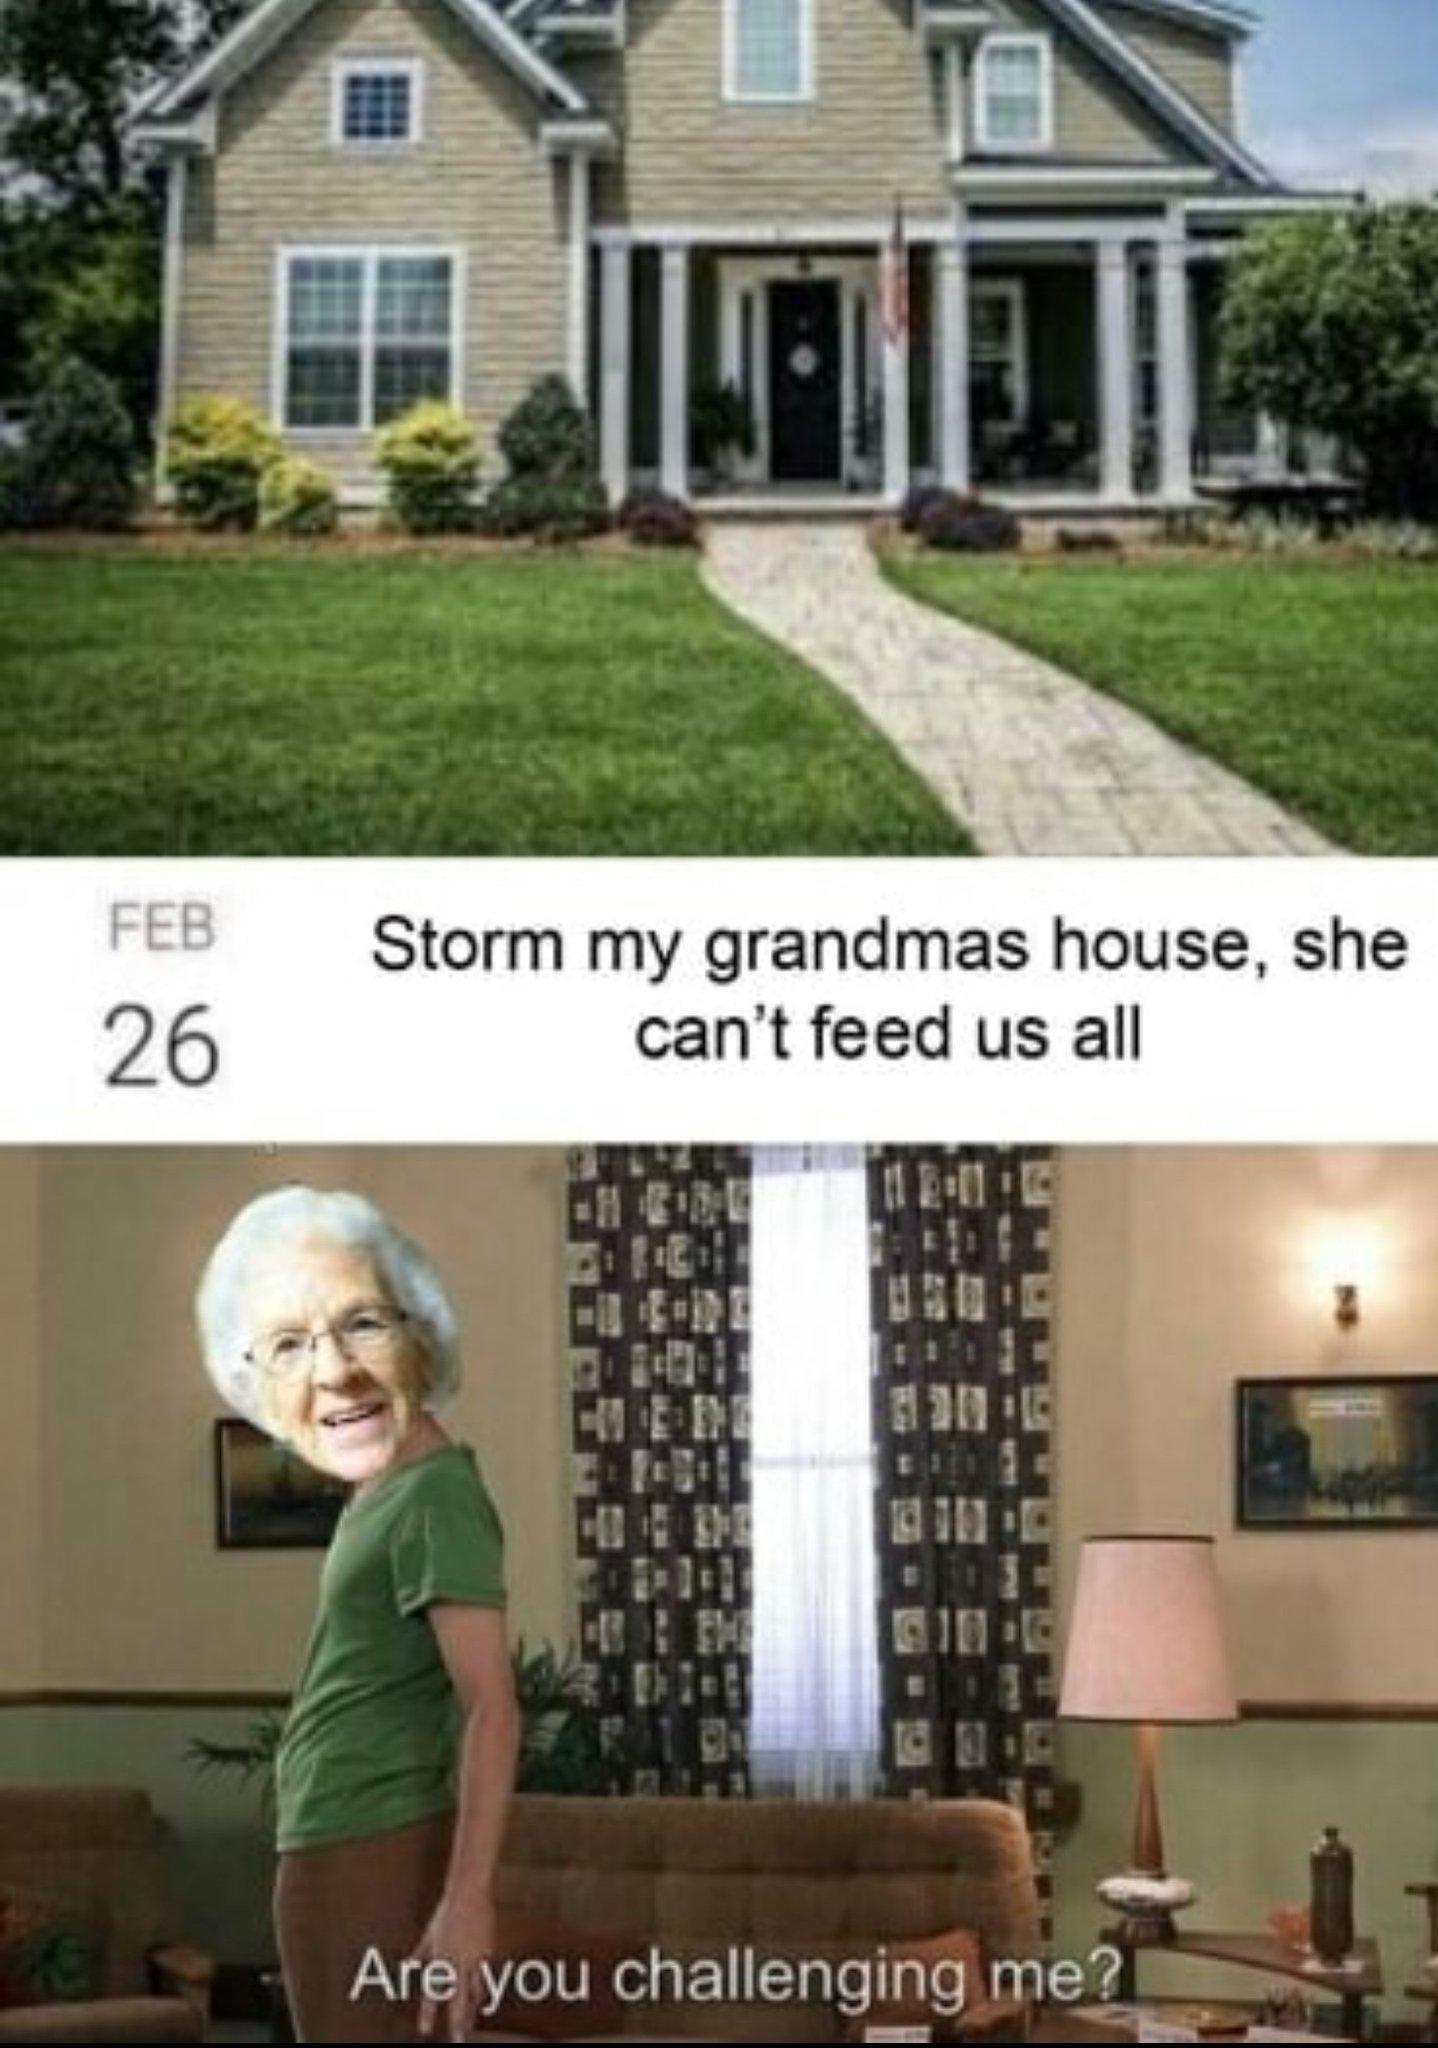 Feb 26th - meme